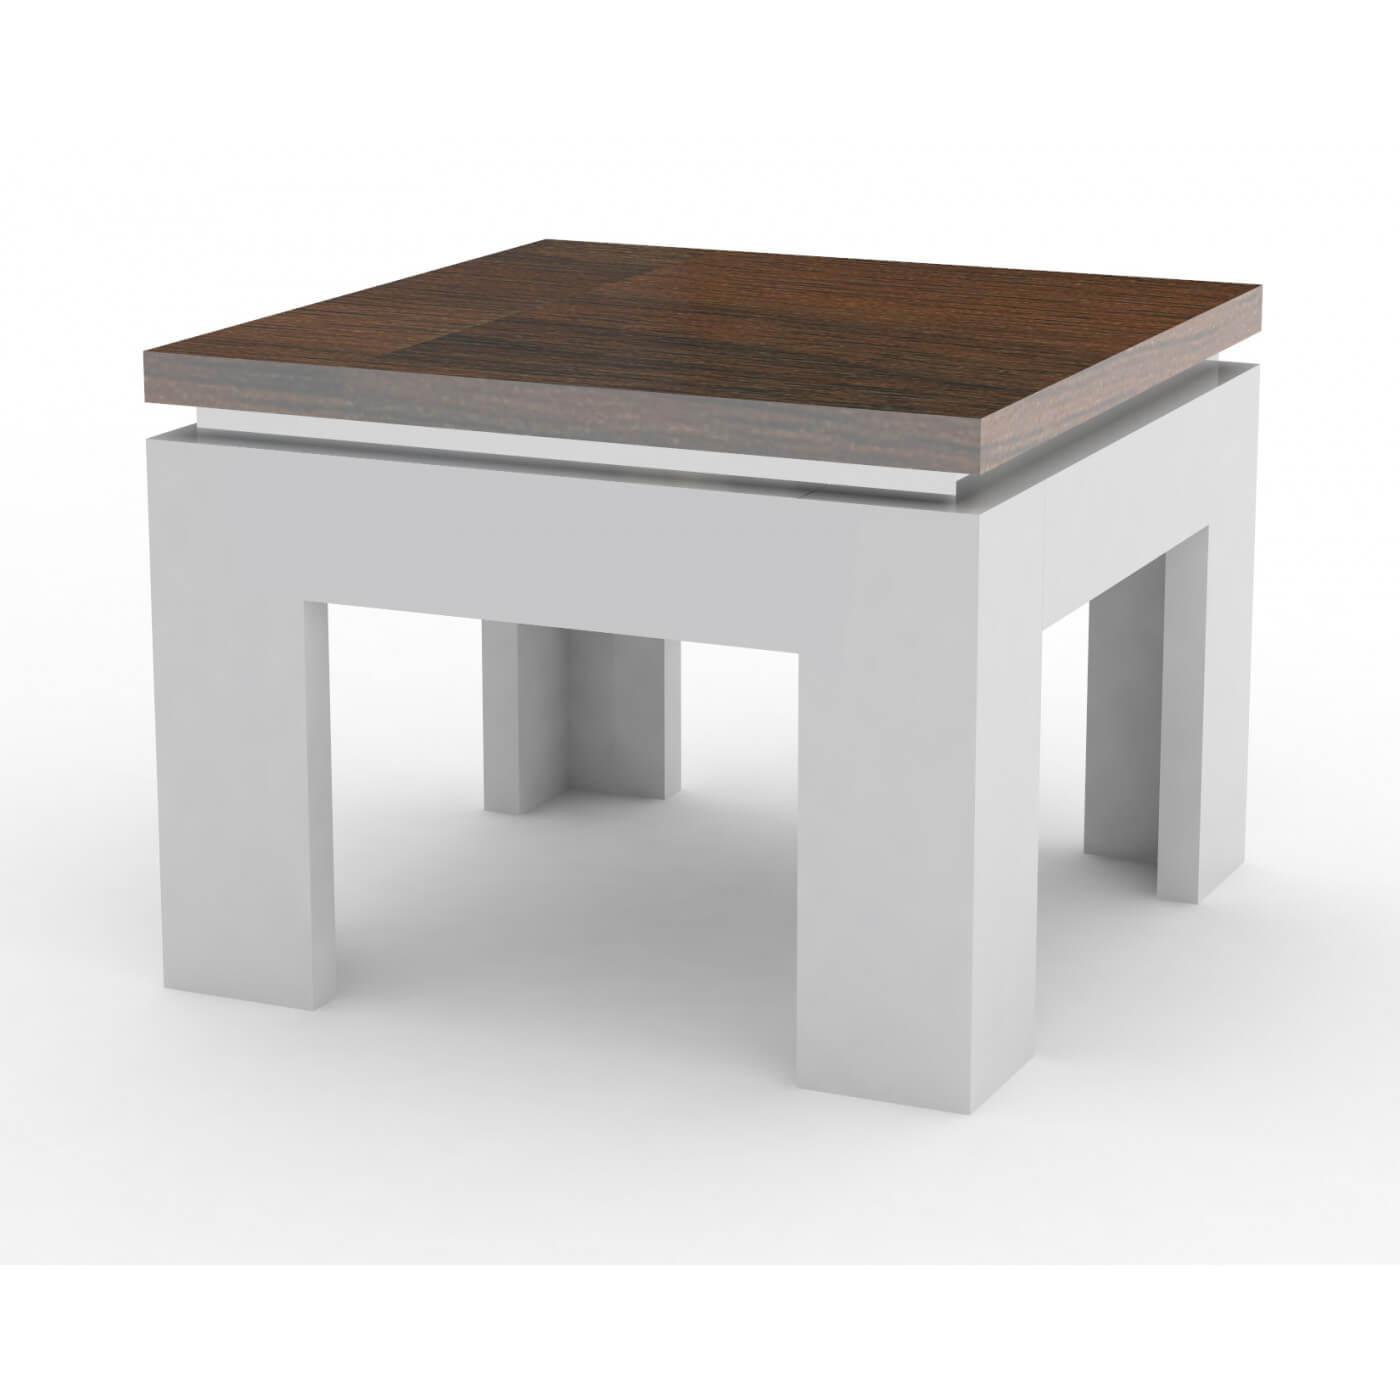 Laquédécor Blanc Noyer Table Basse Carrée Design Ginko qSzMpjVGUL